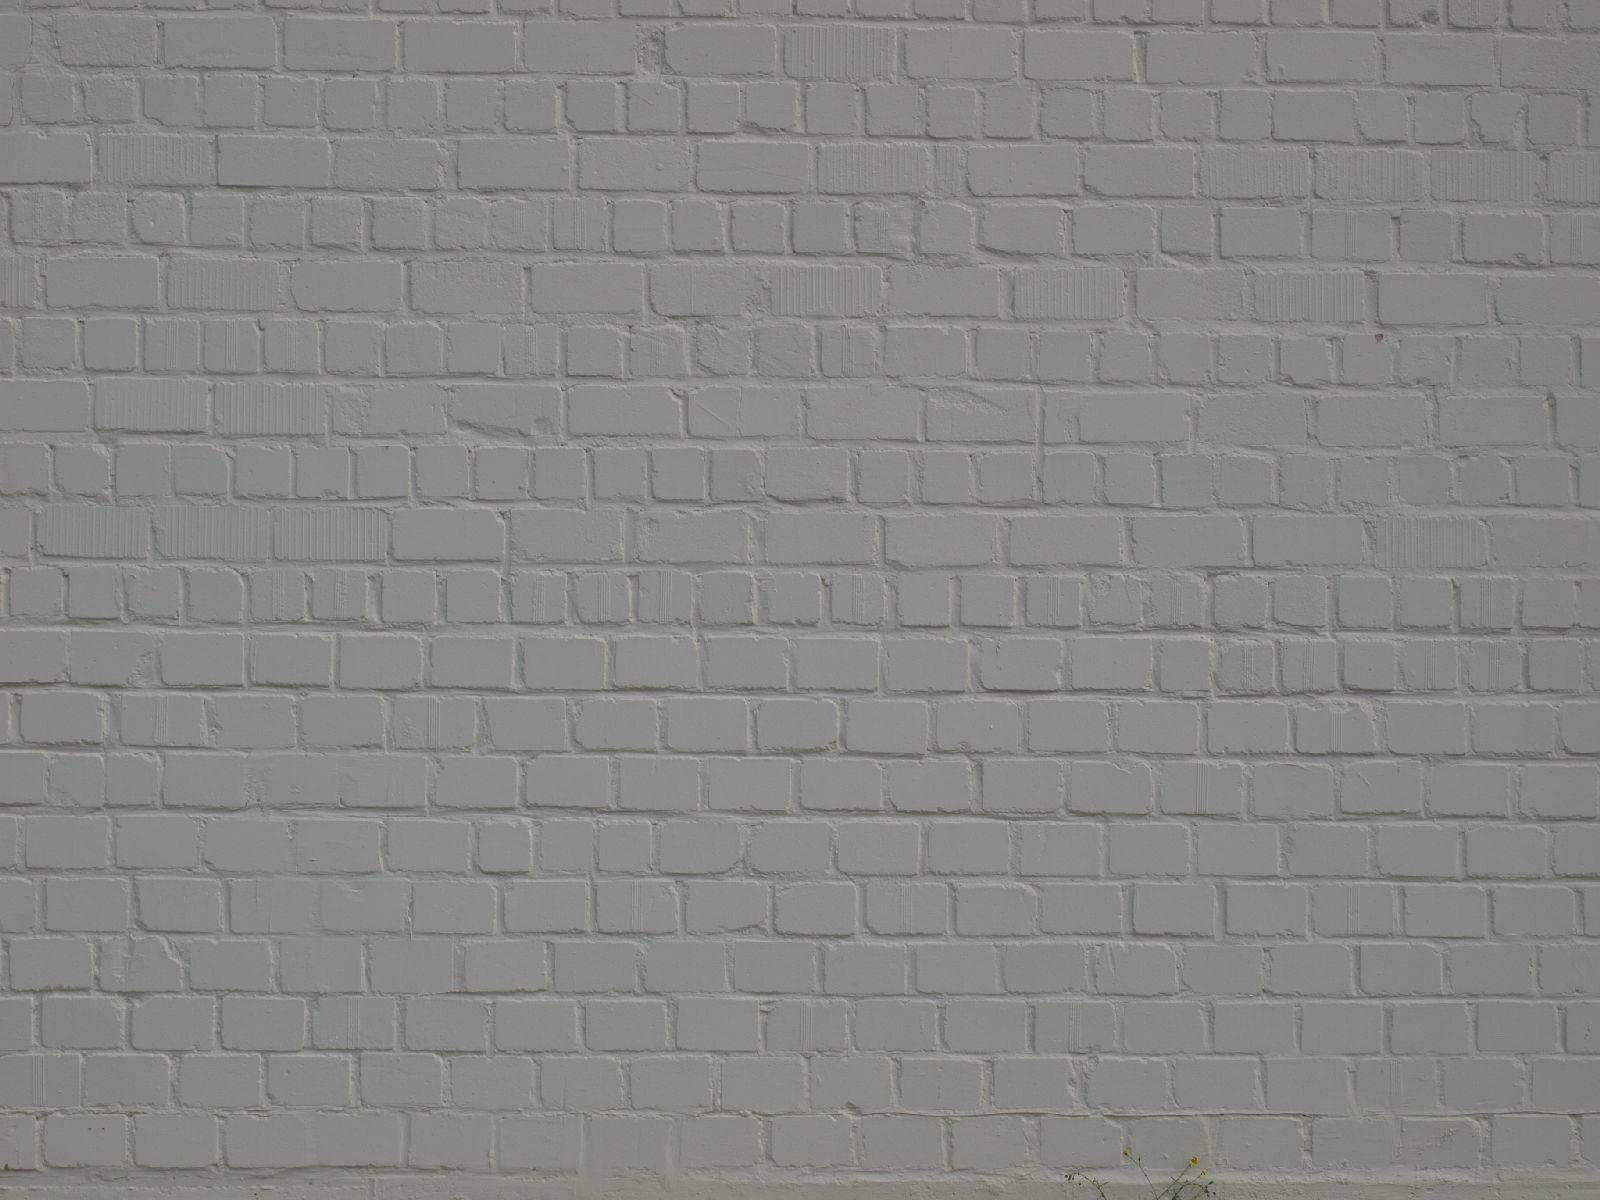 Wand-Mauerwerk-Backstein_Textur_A_P9209789